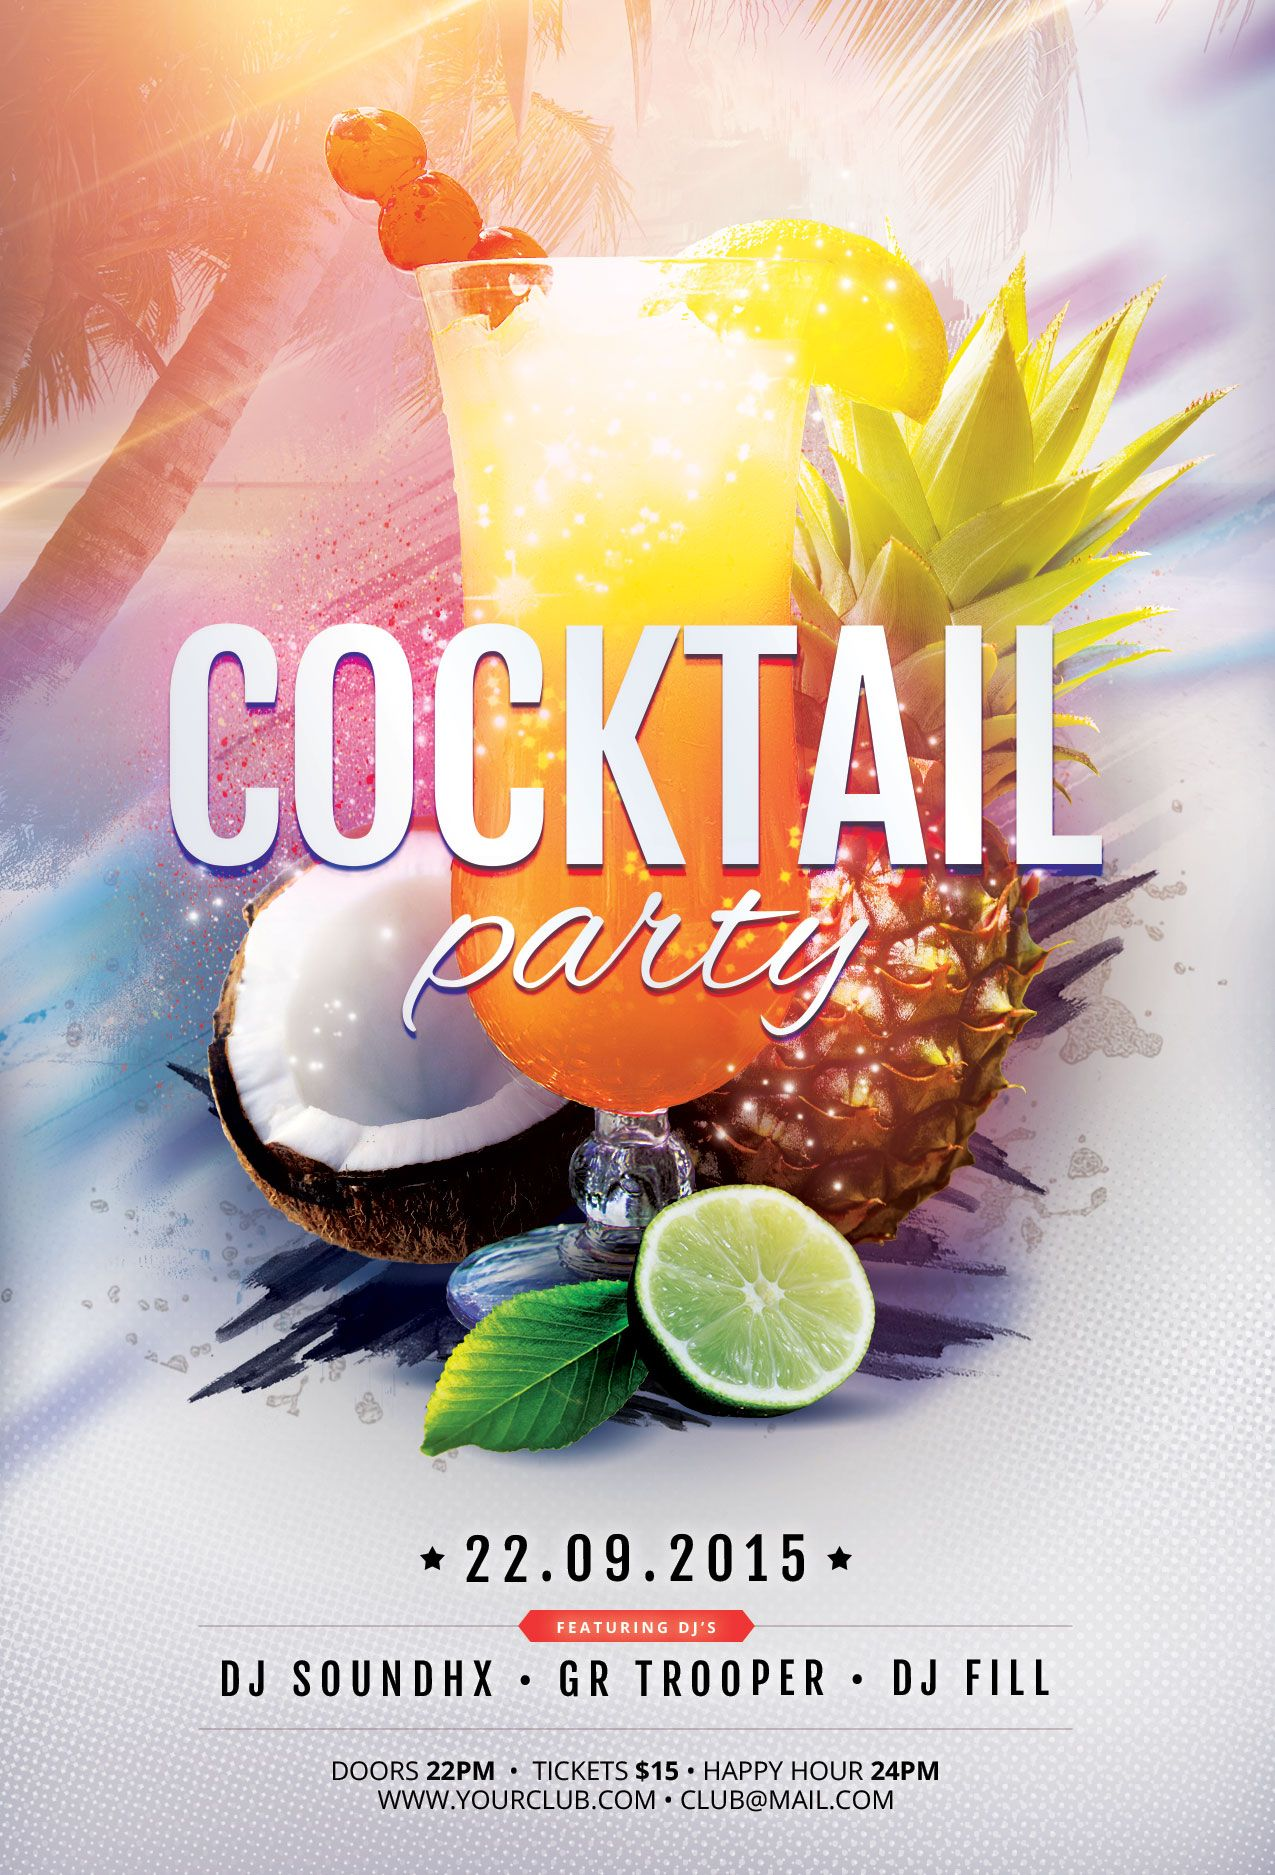 Cocktail party flyer template download psd file 6 cocktail party flyer template download psd file 6 saigontimesfo